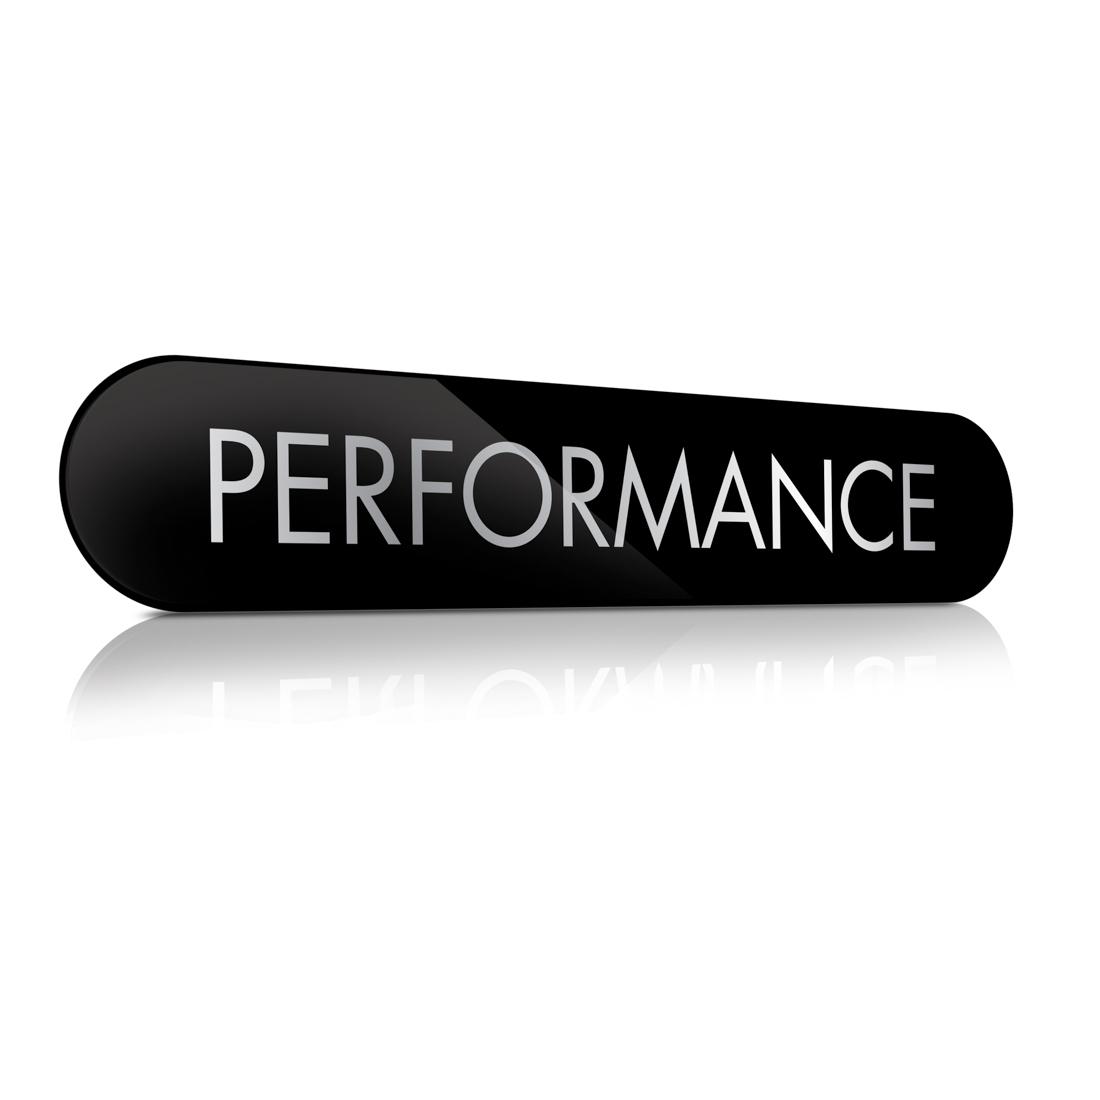 Performance - Slatwall Sign